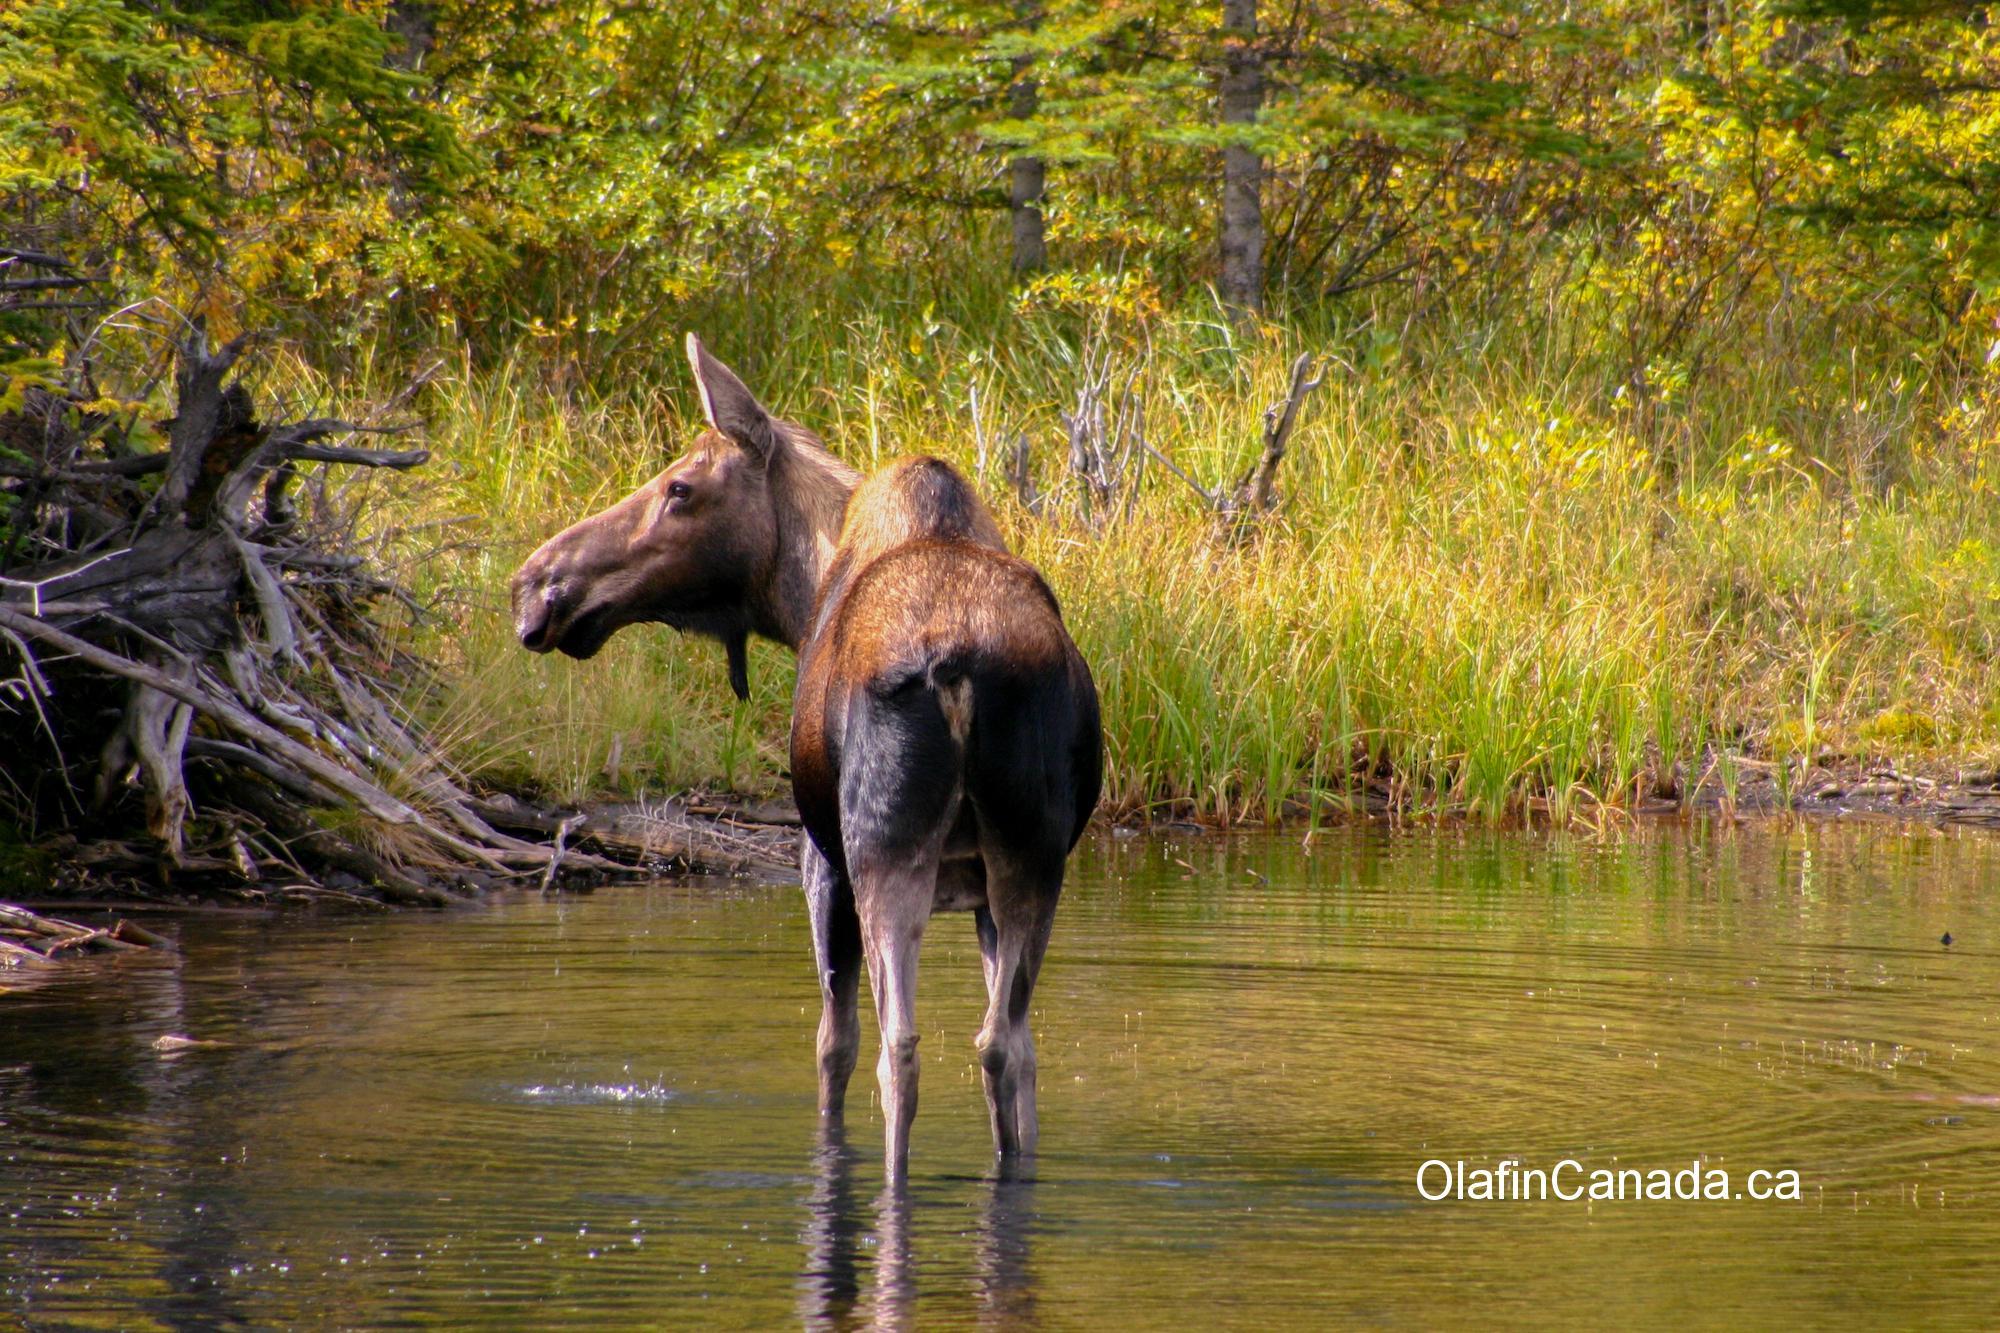 Moose in Kananaskis #olafincanada #alberta #rockies #wildlife #moose